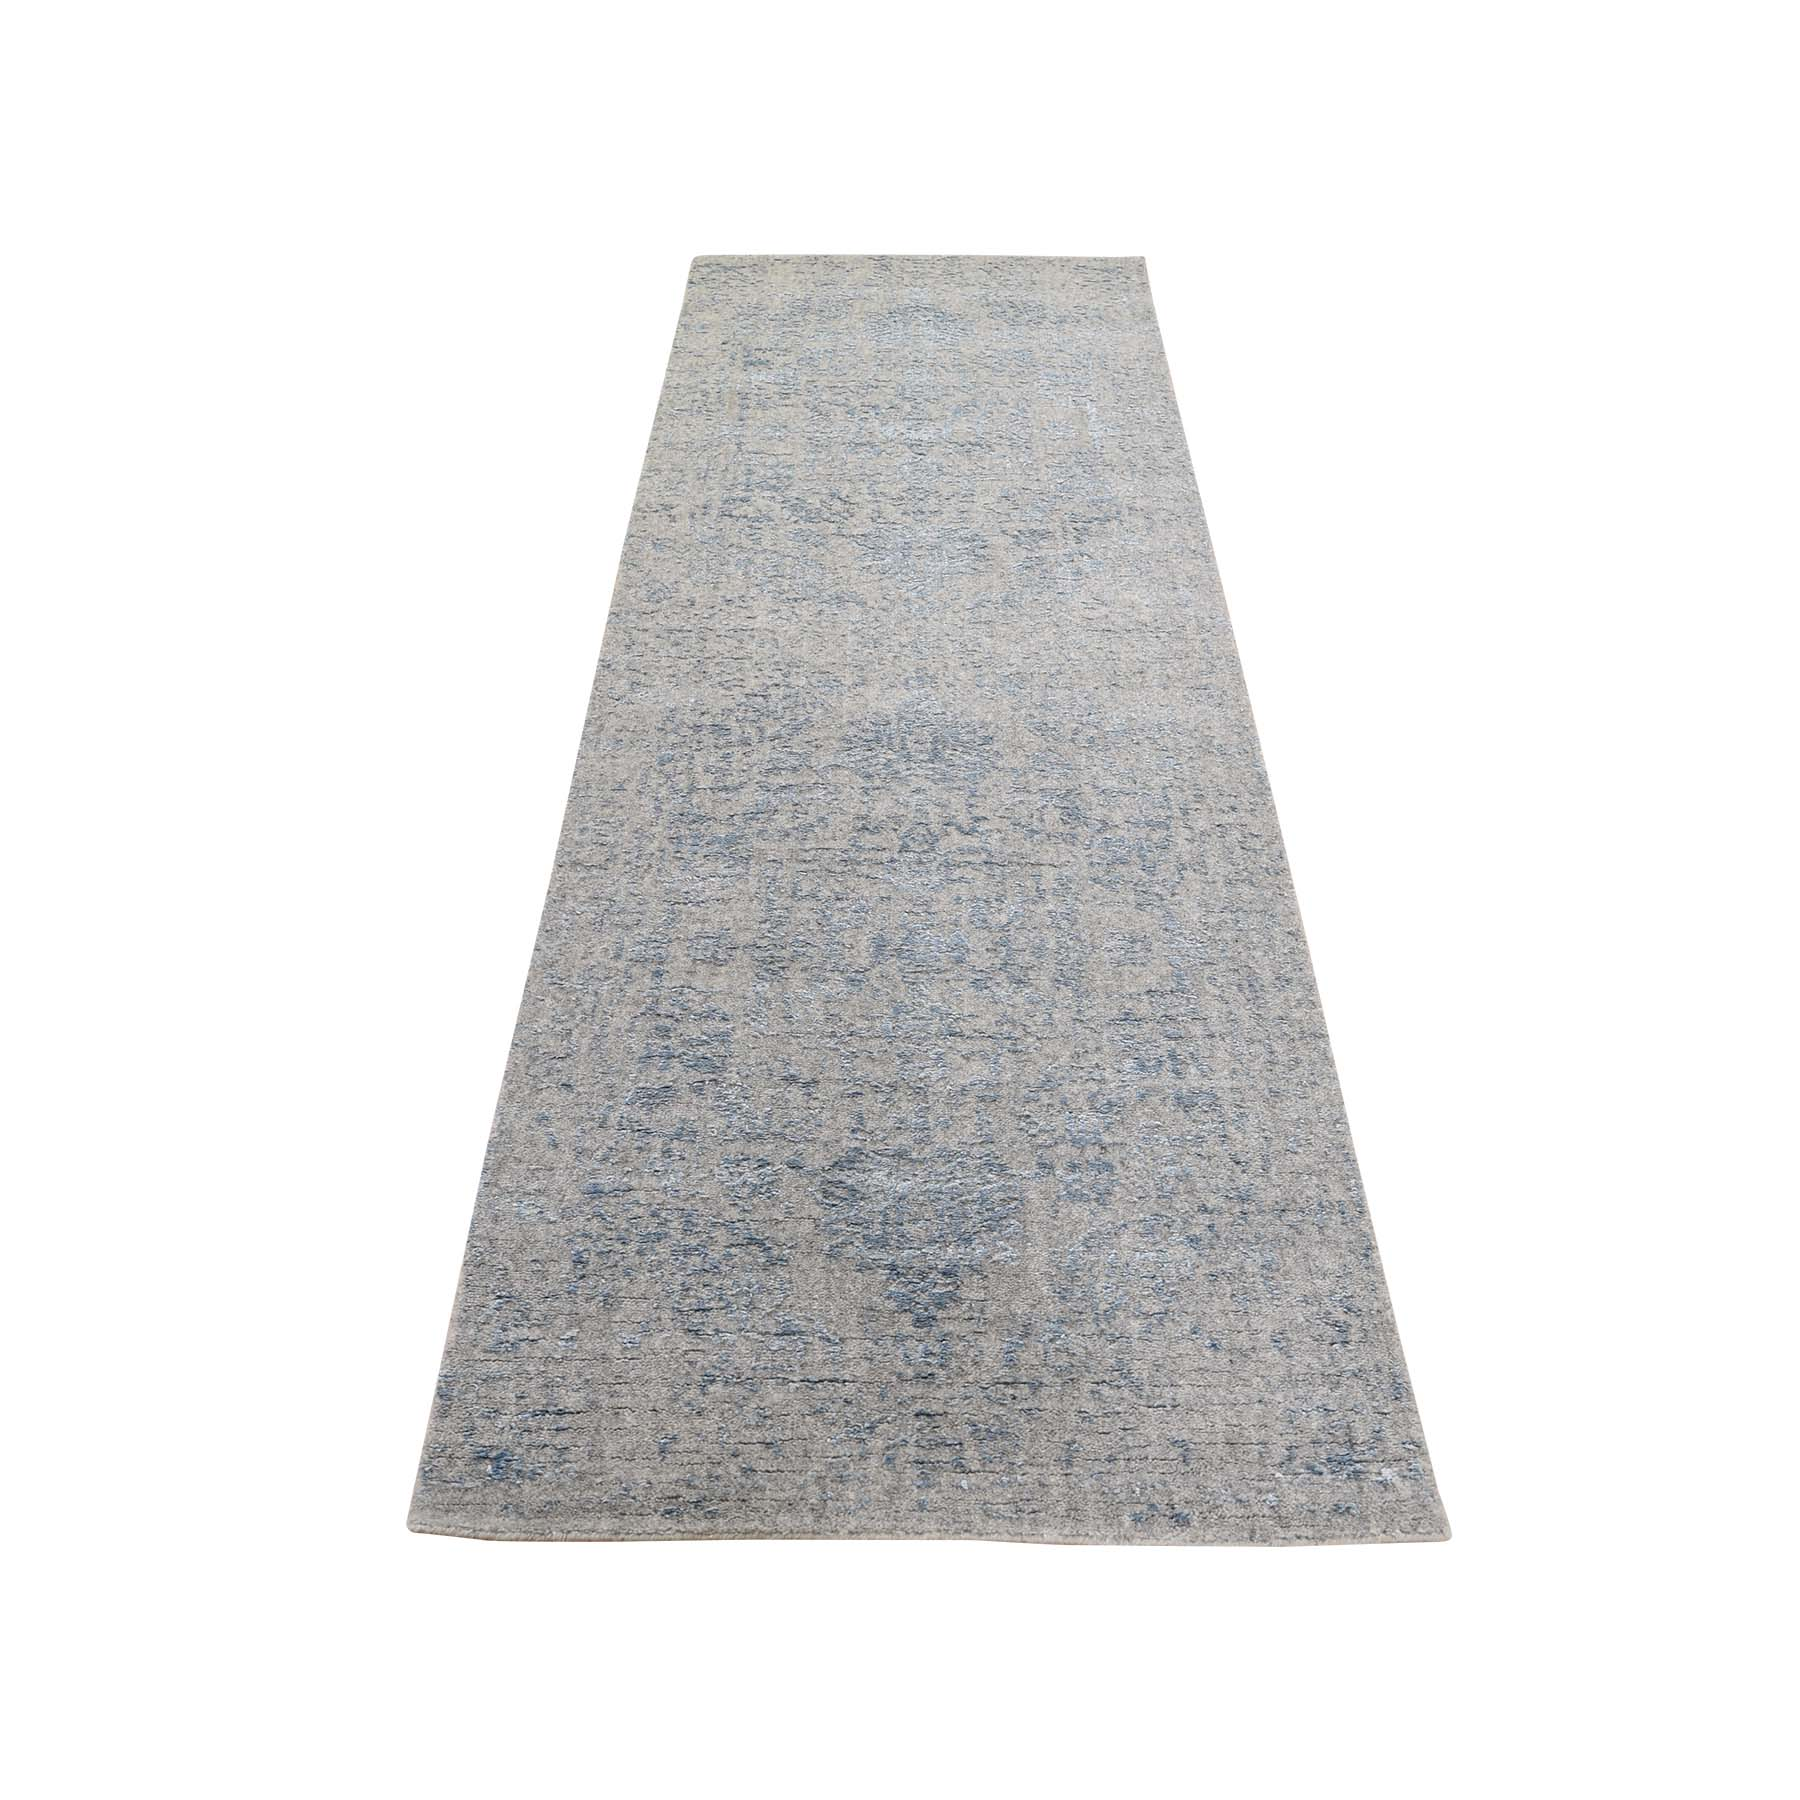 "2'5""X9'10"" Jacquard Hand-Loomed Silken Grey Broken Persian Heriz Design Runner Oriental Rug moadee69"